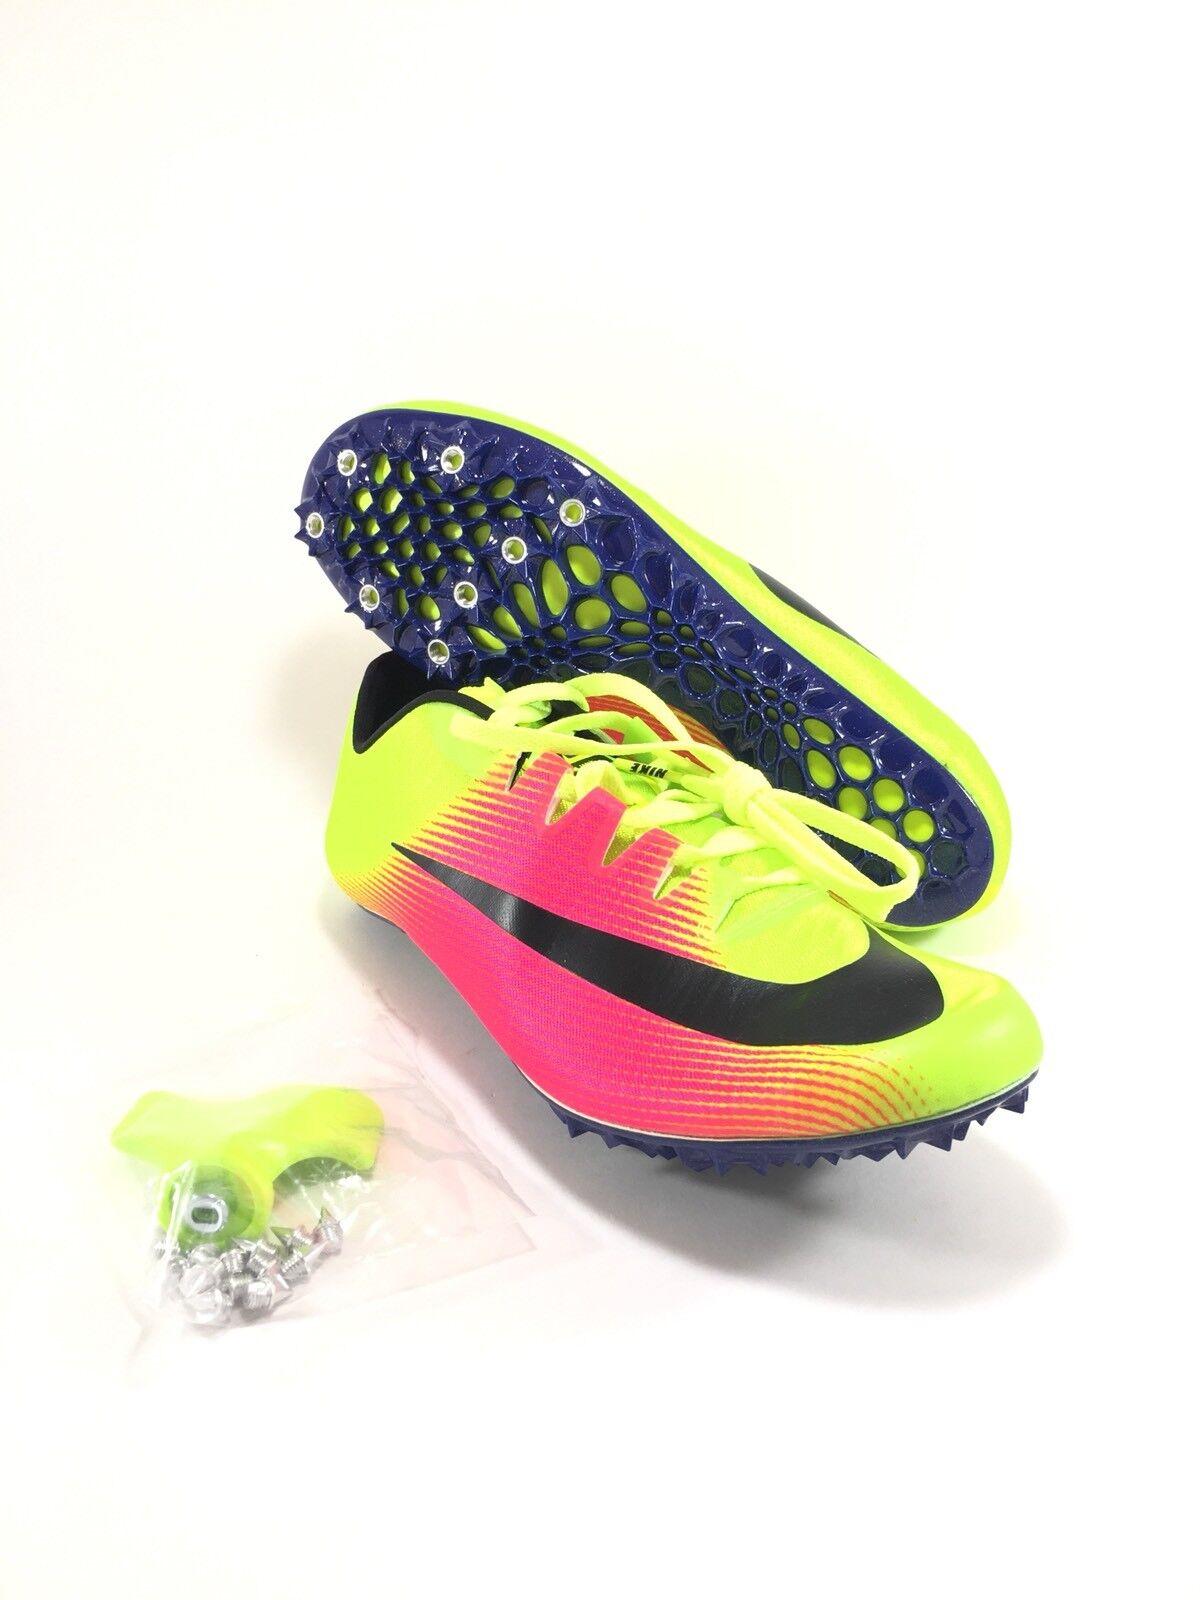 Nike Zoom Men's JA FLY 3 OC Rio Track & Field Spikes Volt Size 11.5 (882032-999)